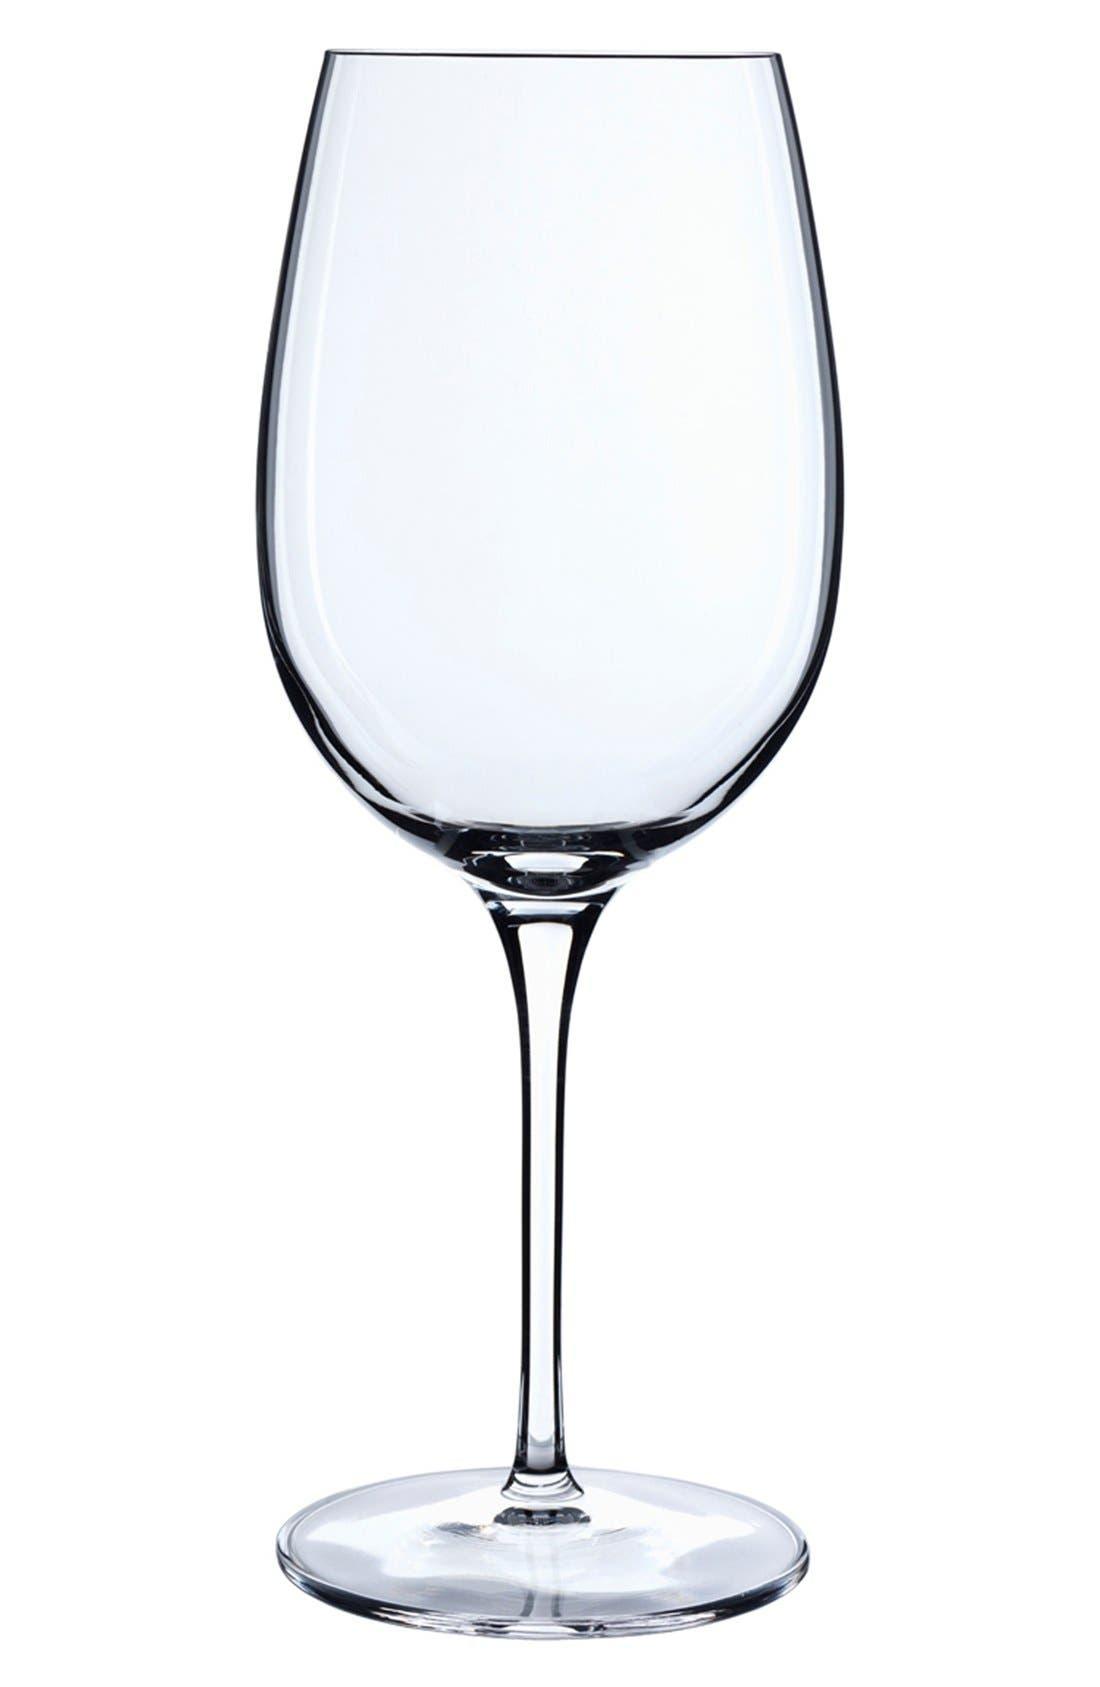 Main Image - Luigi Bormioli 'Crescendo' Bordeaux Glasses (Set of 4)